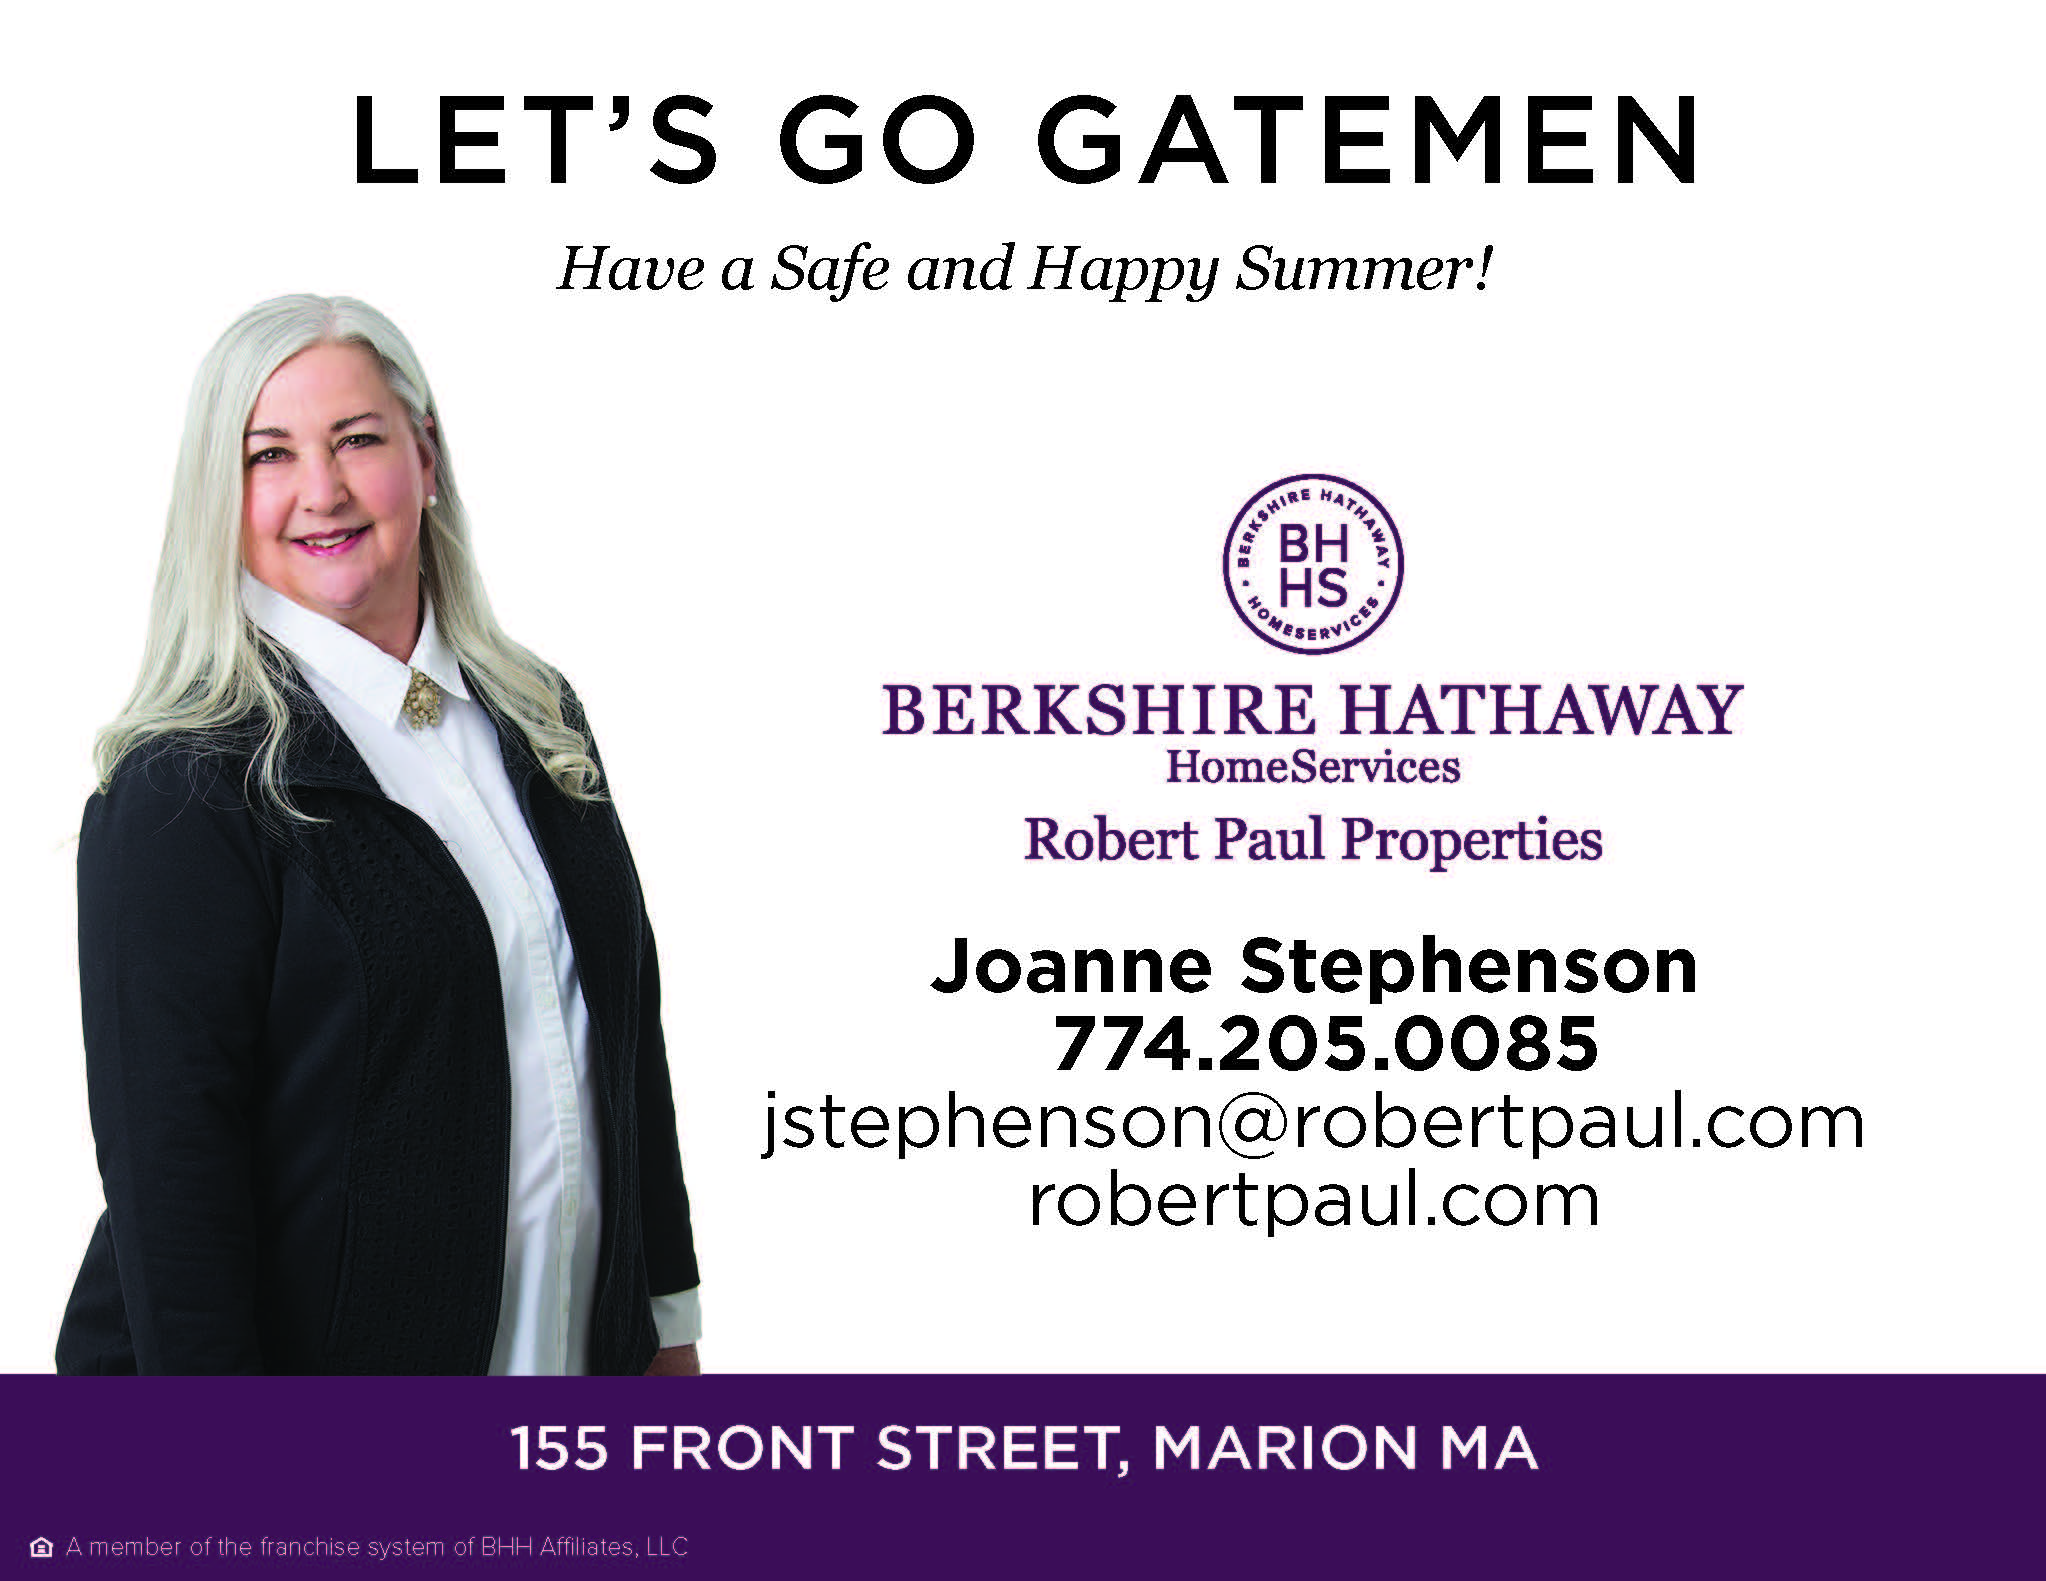 Joanne Stephenson - https://www.robertpaul.com/agents/76584-joanne-stephenson